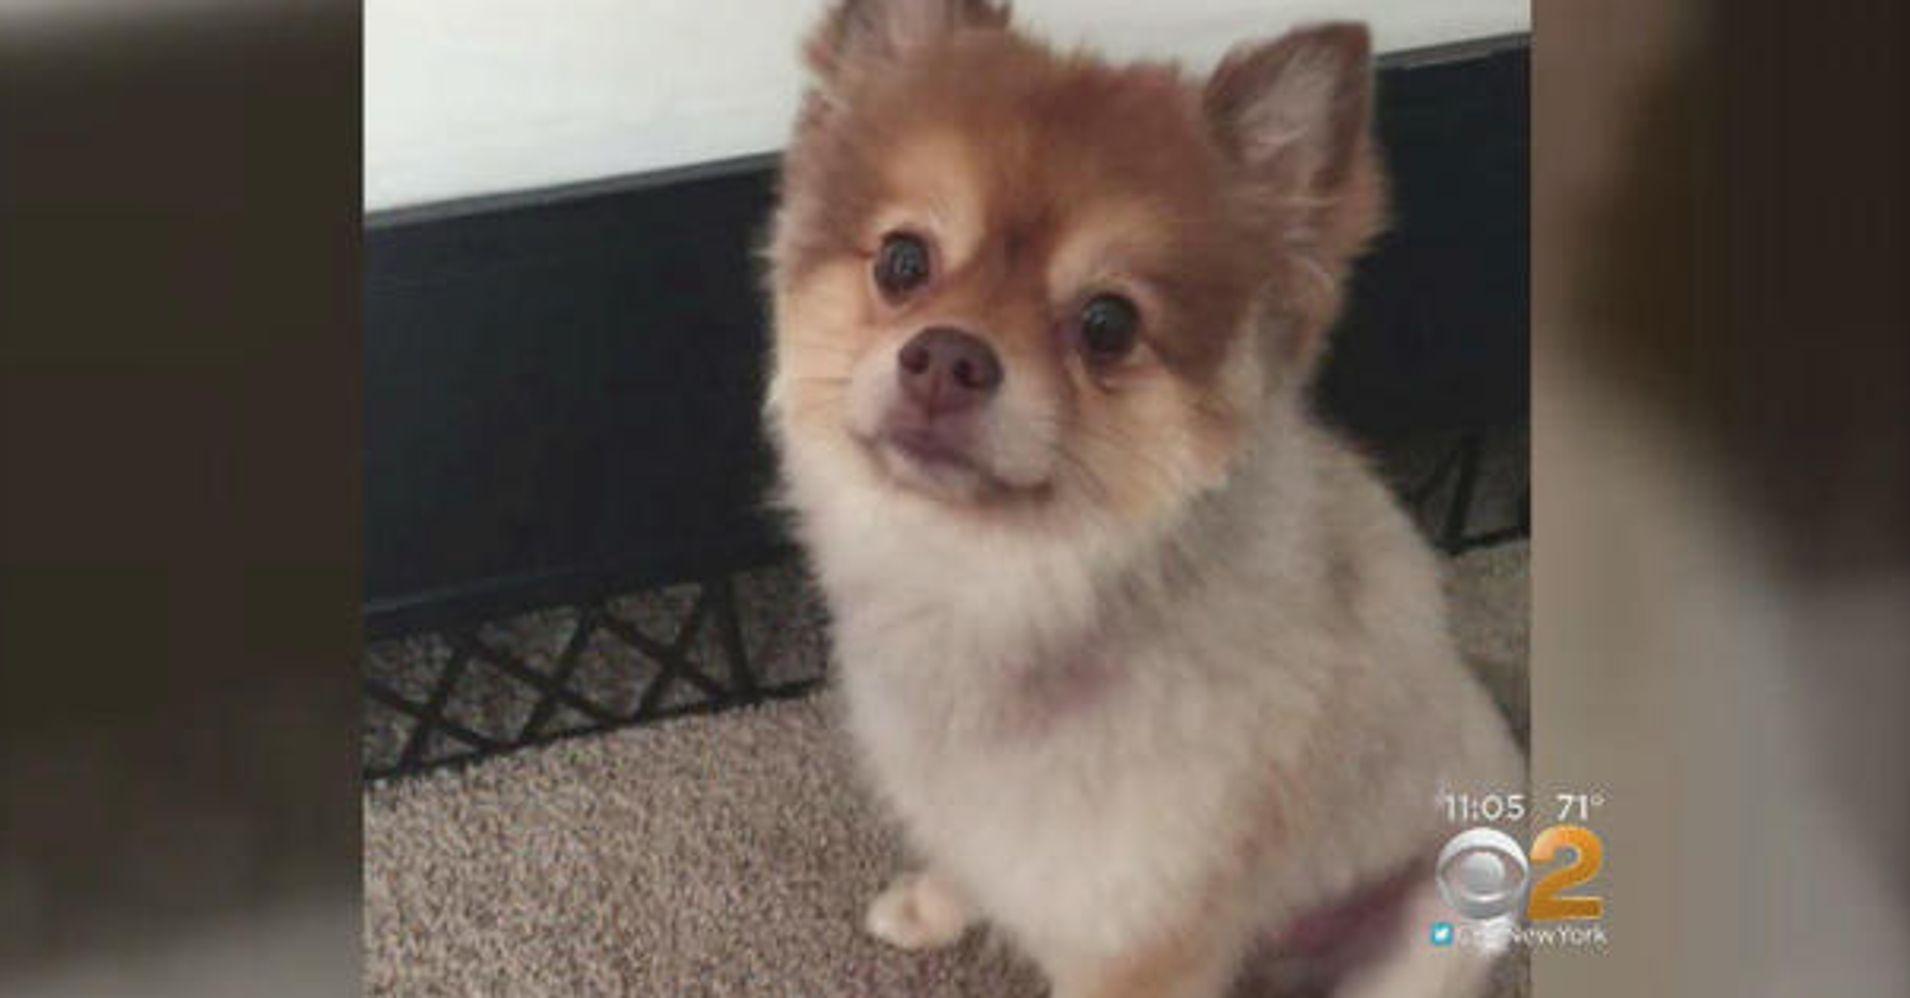 Dog Found Dead During Layover Between Delta Flights